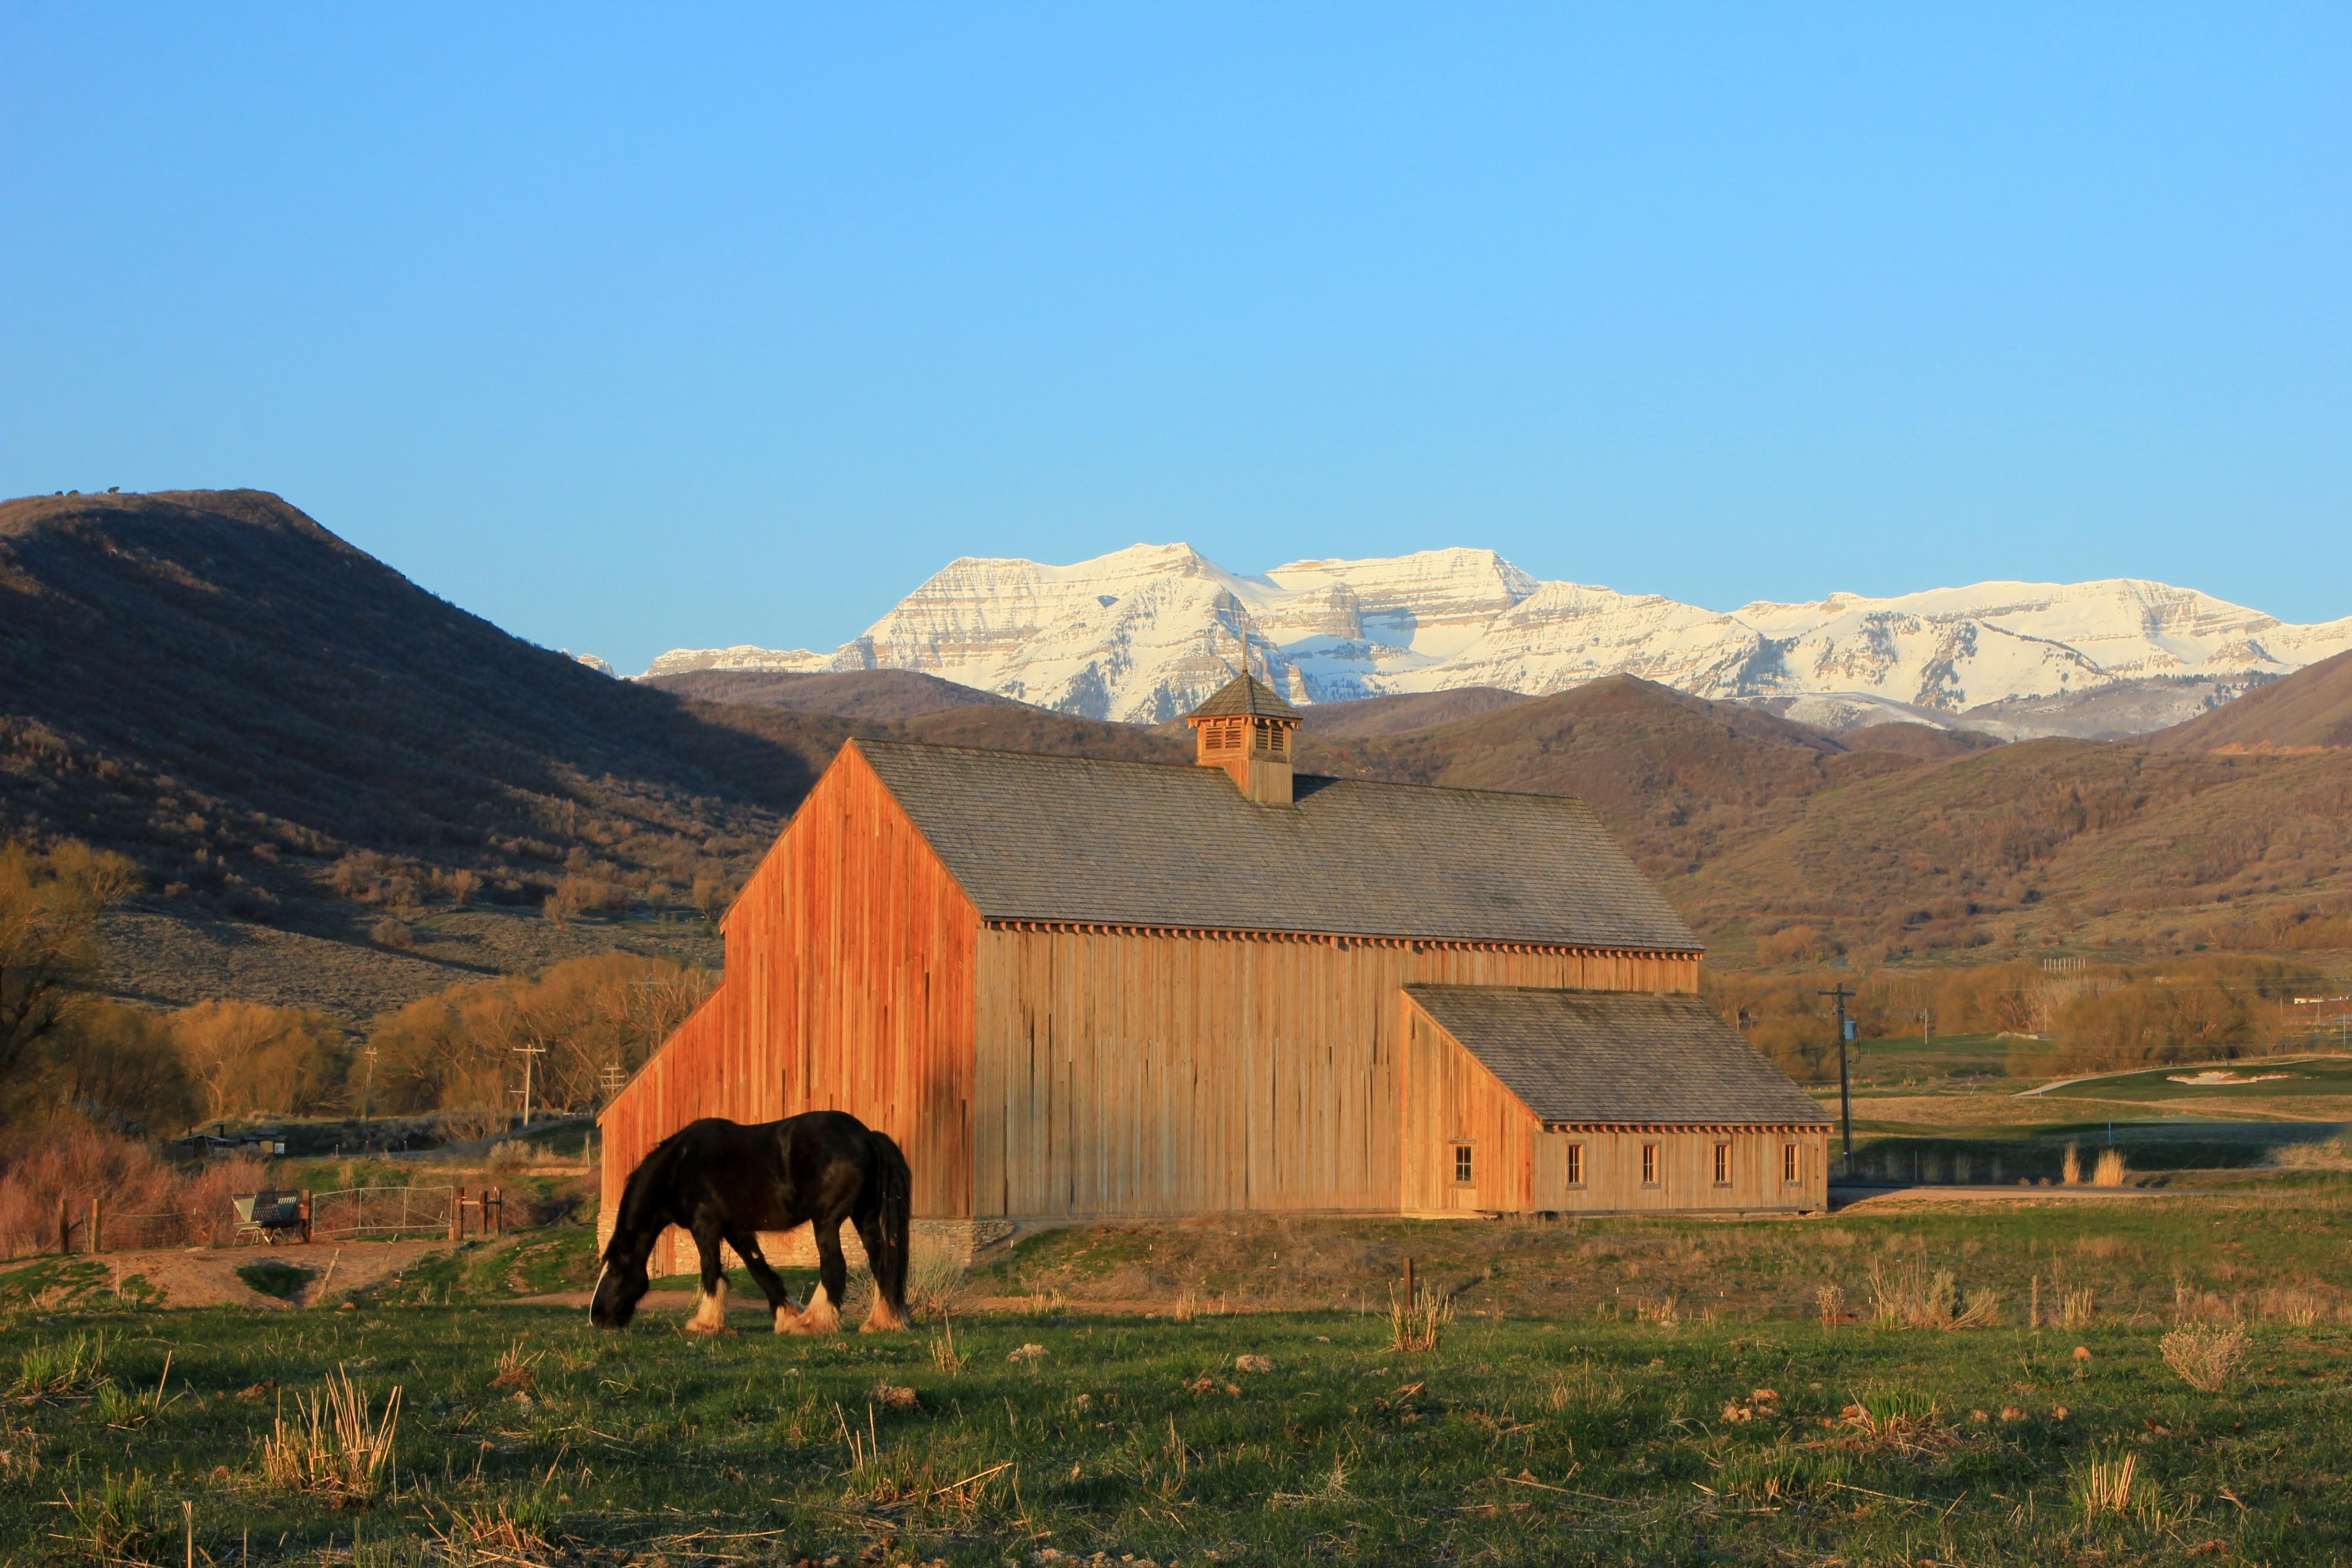 Heber City, Utah, United States of America